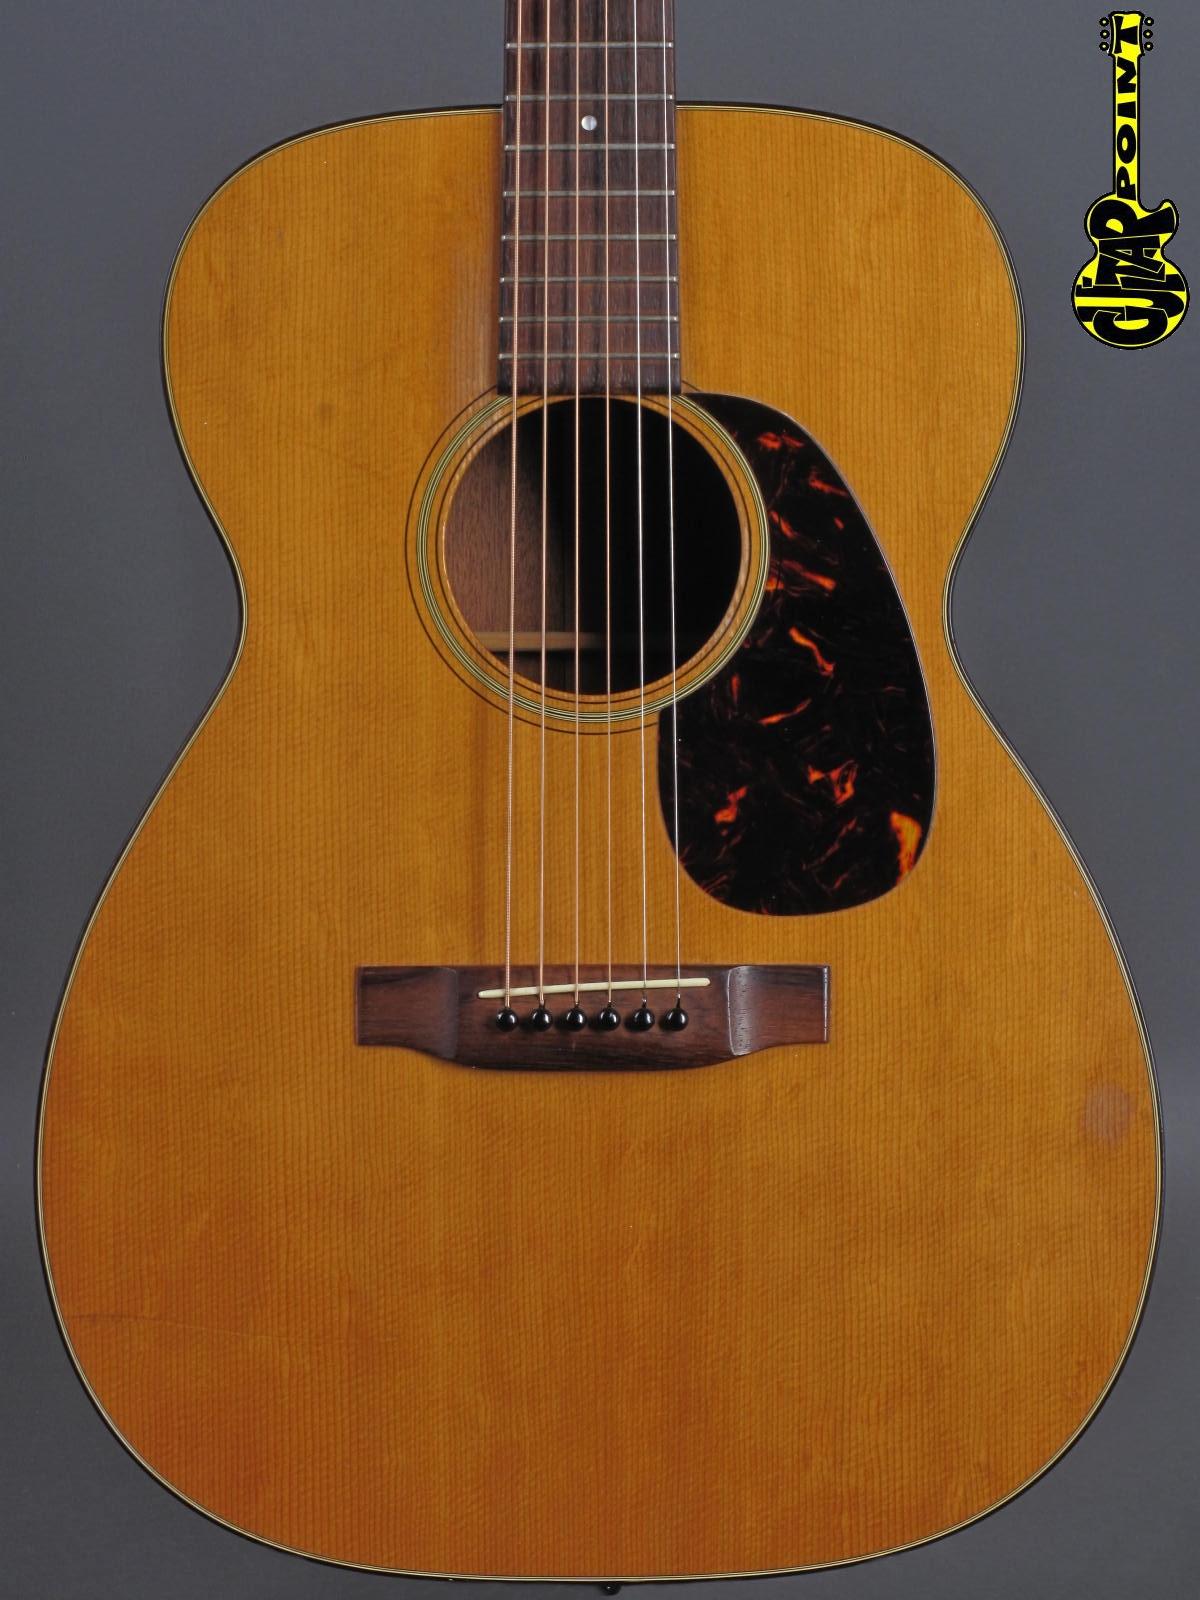 1967 Martin 00-18 - Natural